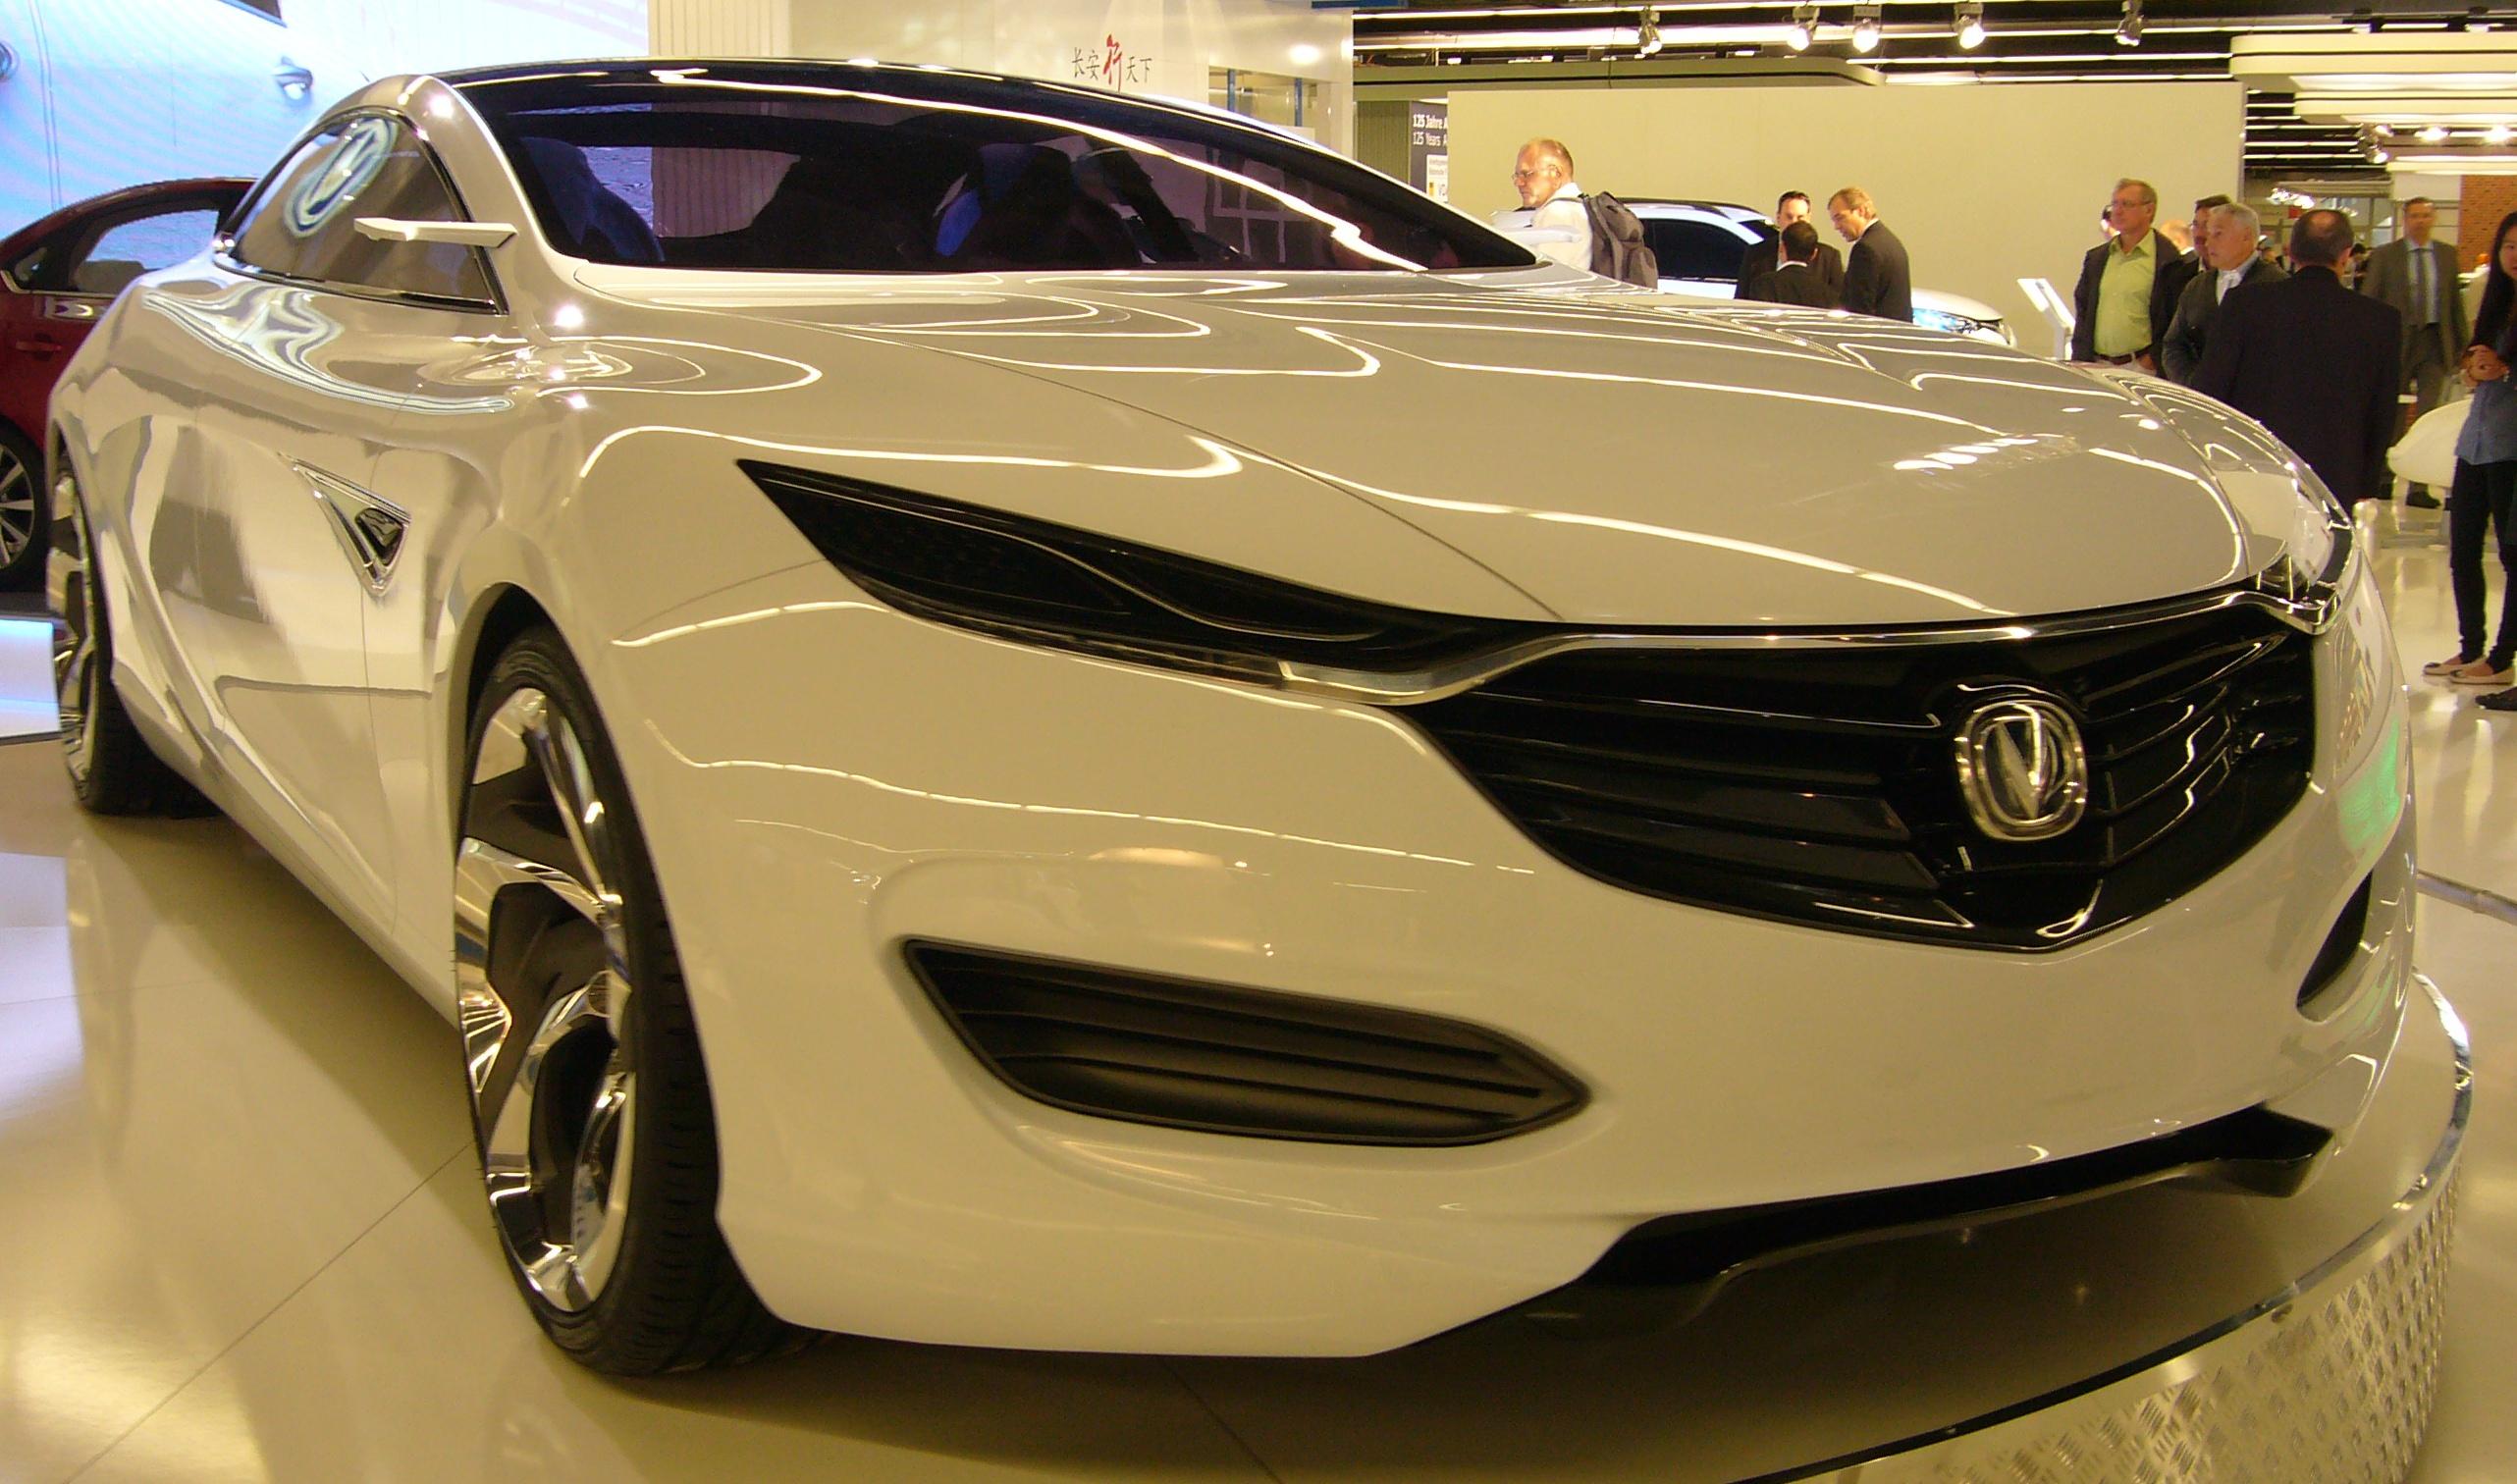 Build Your Own Car >> File:Changan Sense (front quarter).jpg - Wikimedia Commons